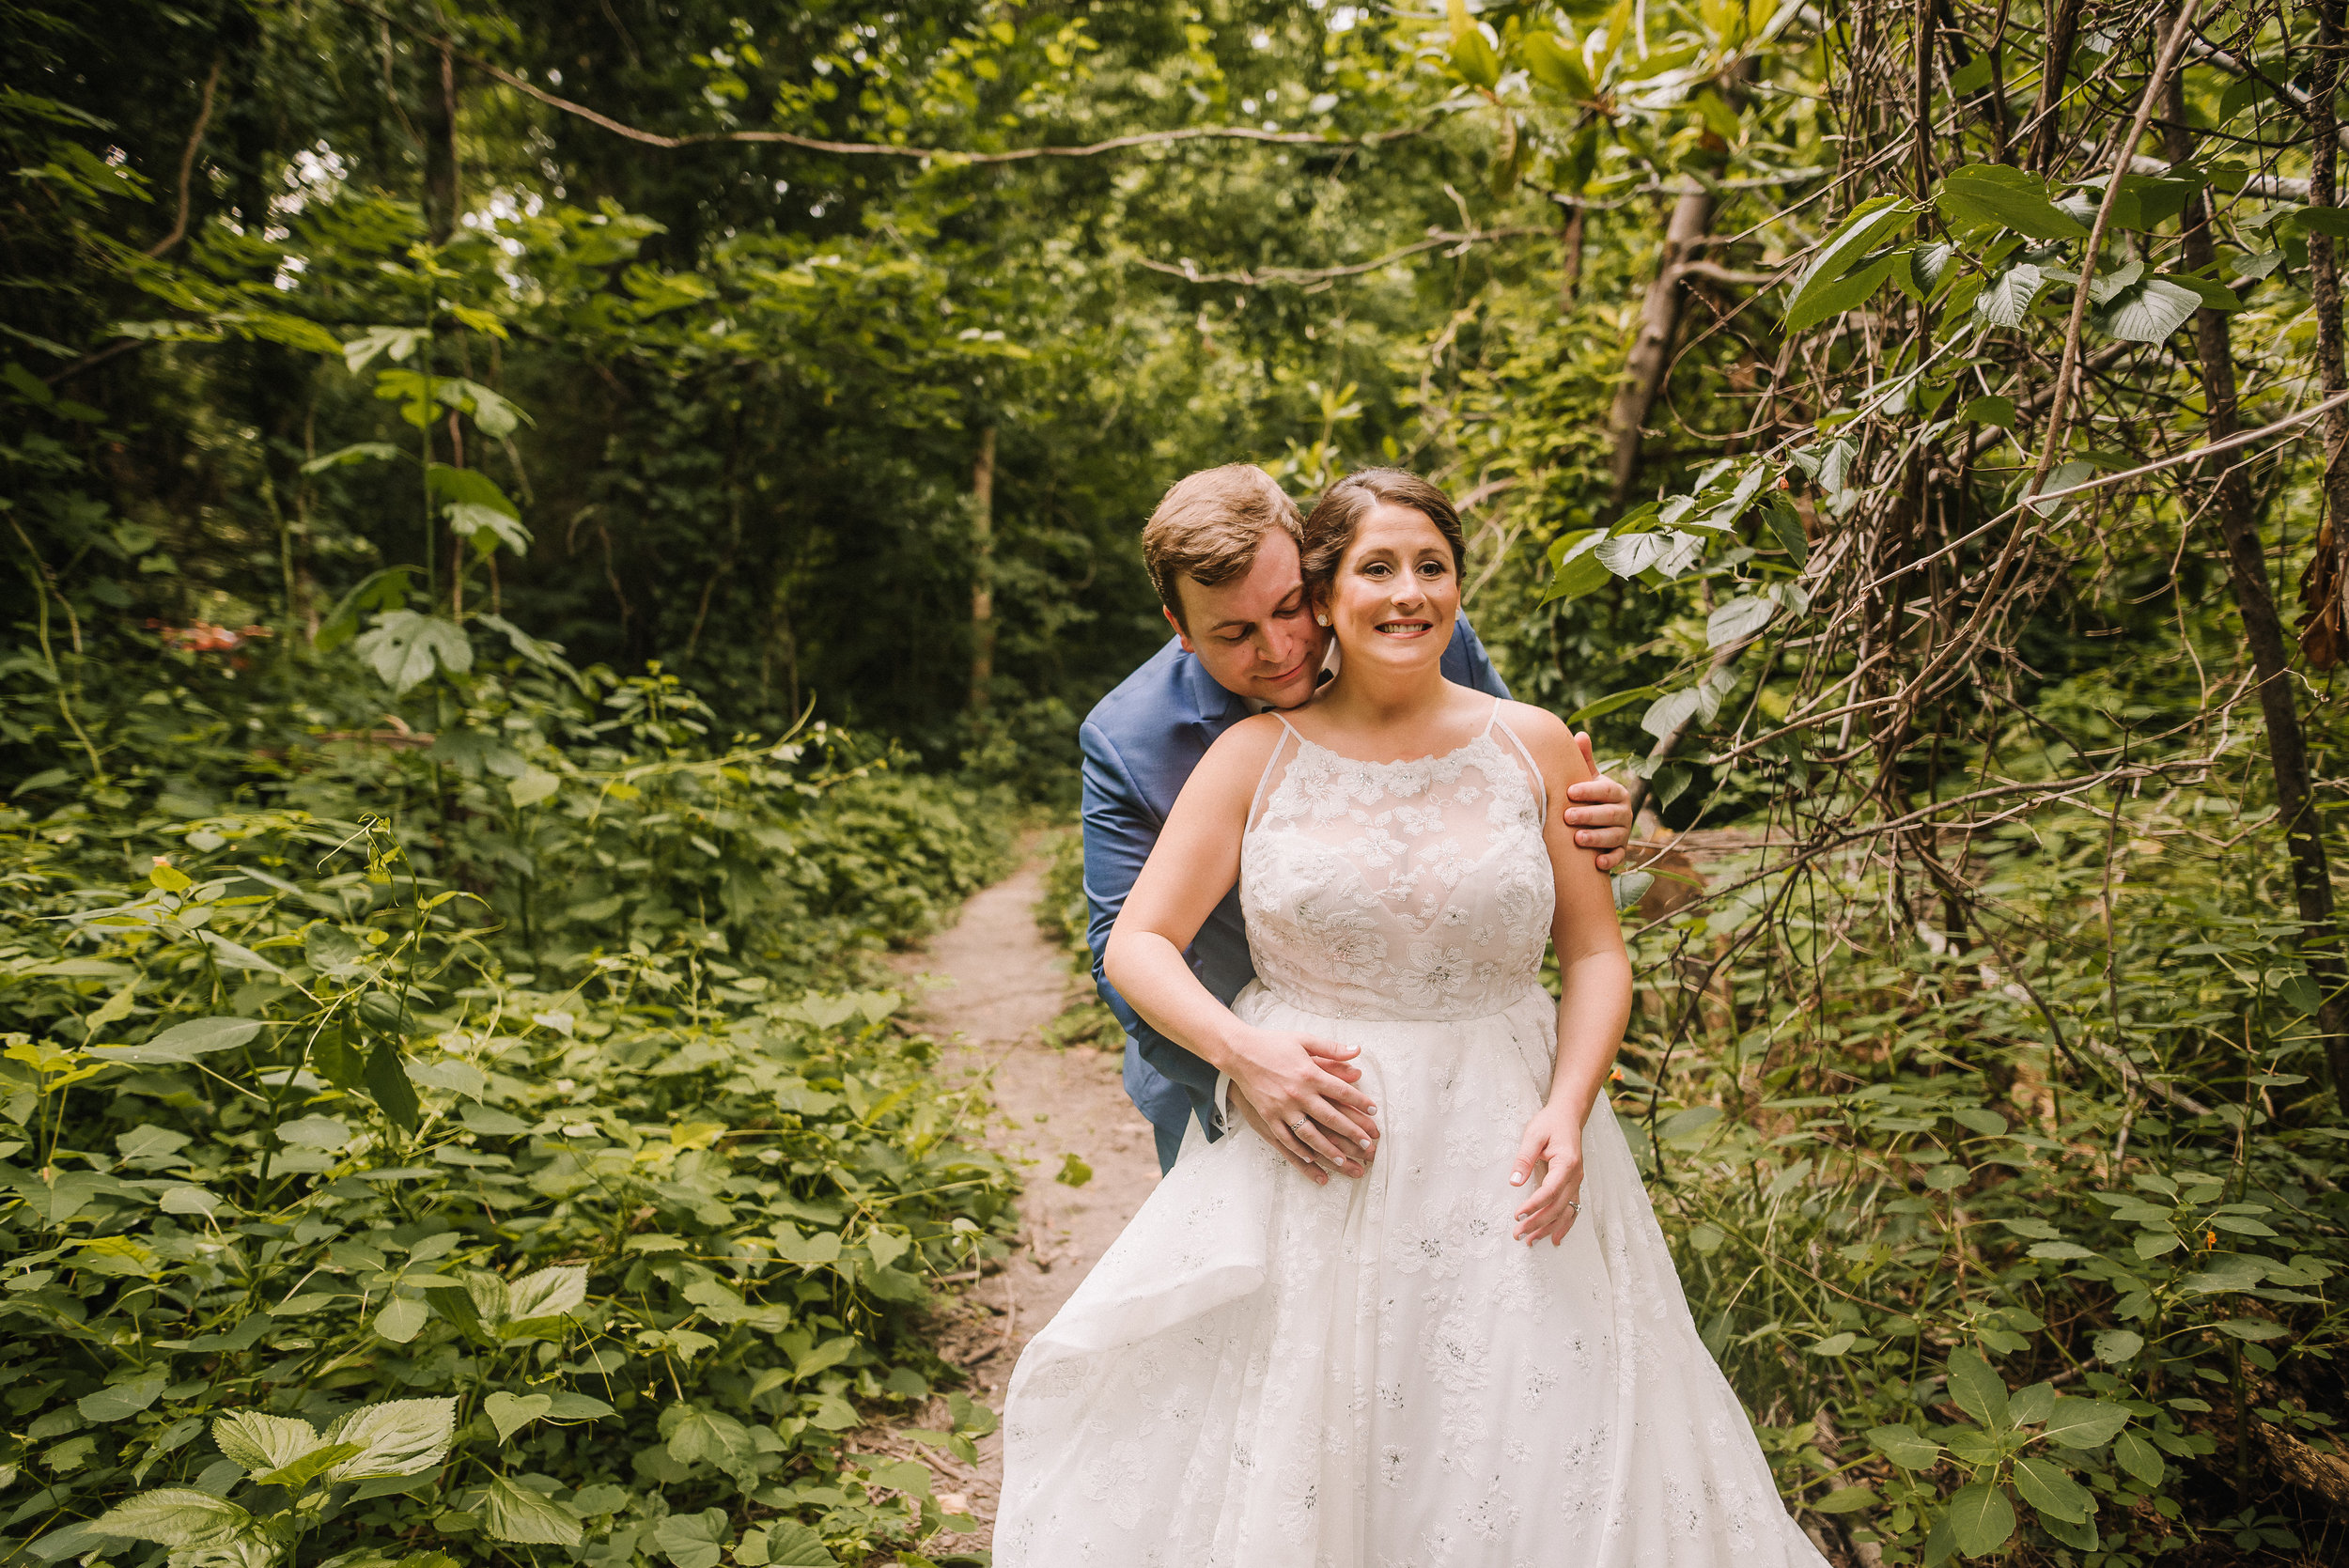 Smith Wedding_Memphis Zoo_Ashley Benham Photography-458.jpg